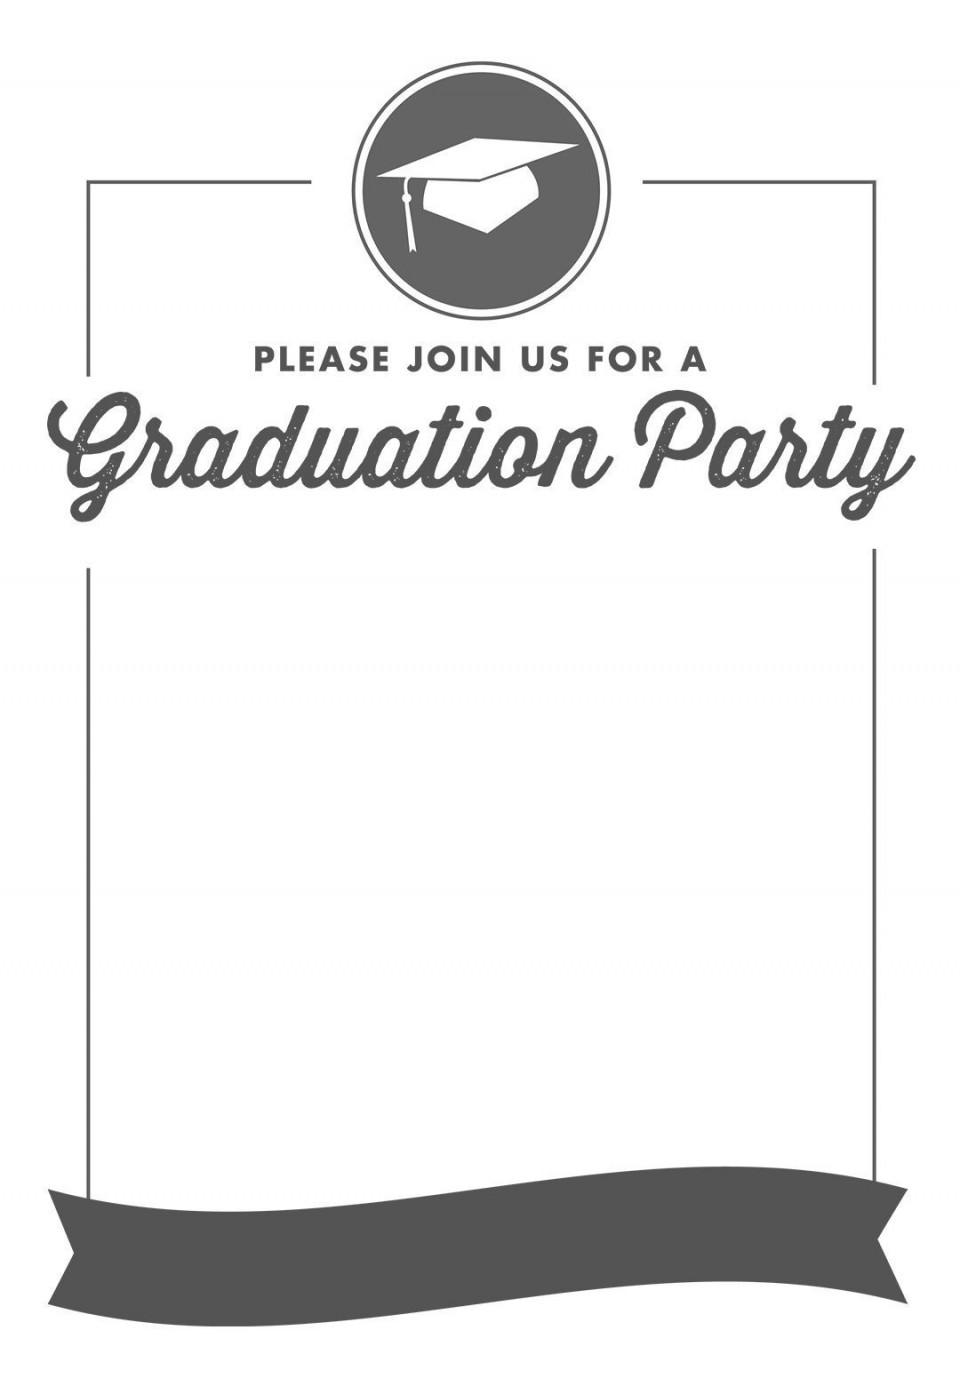 002 Unbelievable Free Graduation Invitation Template Printable High Resolution  Kindergarten Party Card960